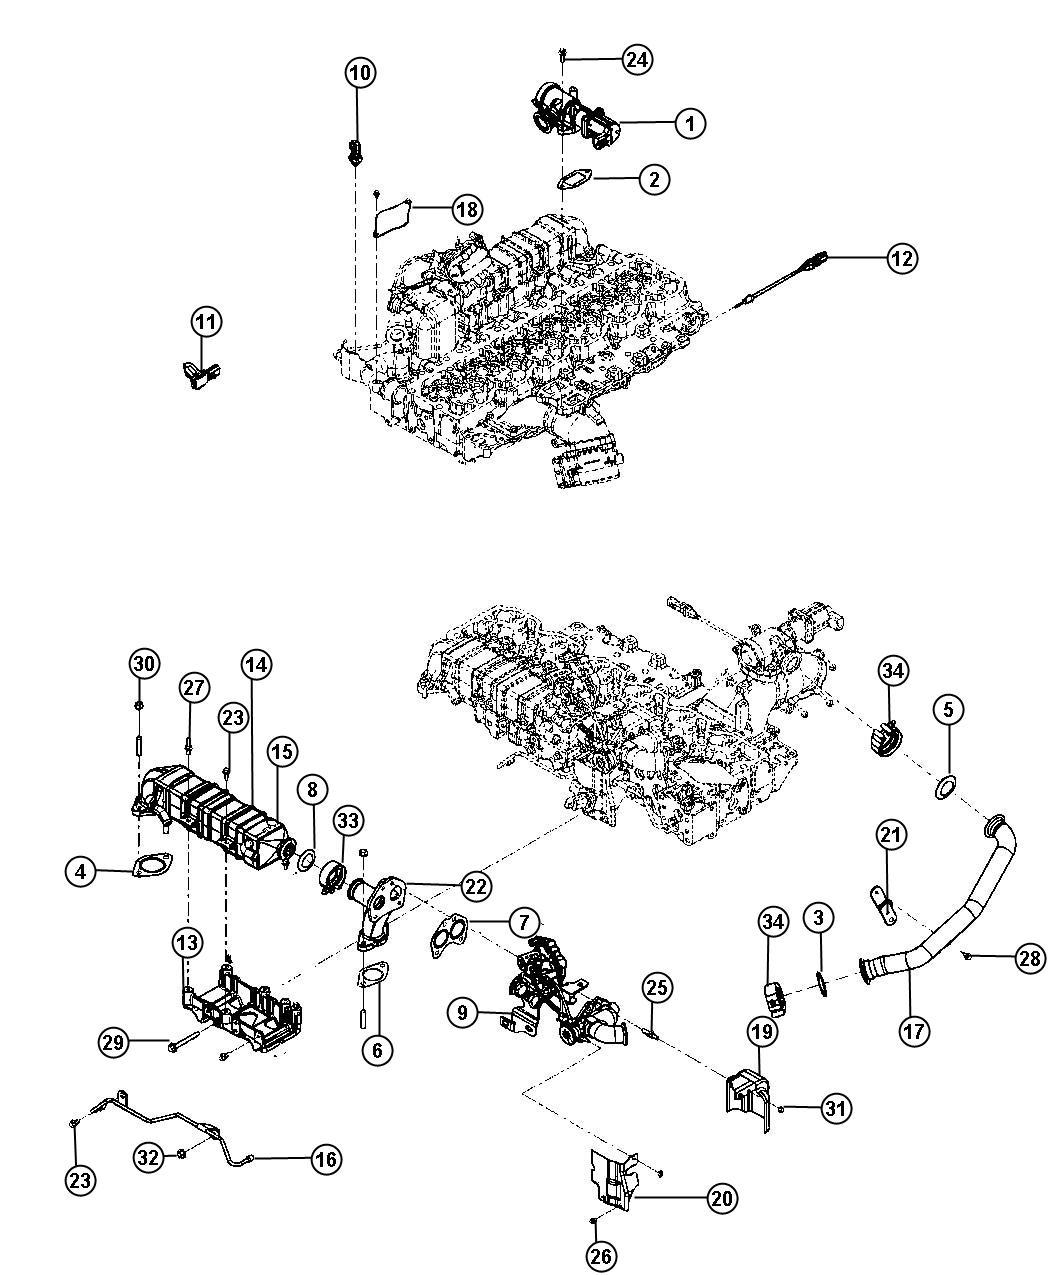 tags: #1997 nissan maxima egr valve location#nissan maxima egr valve  location#2005 nissan sentra egr valve#1999 nissan pathfinder egr valve# nissan cv